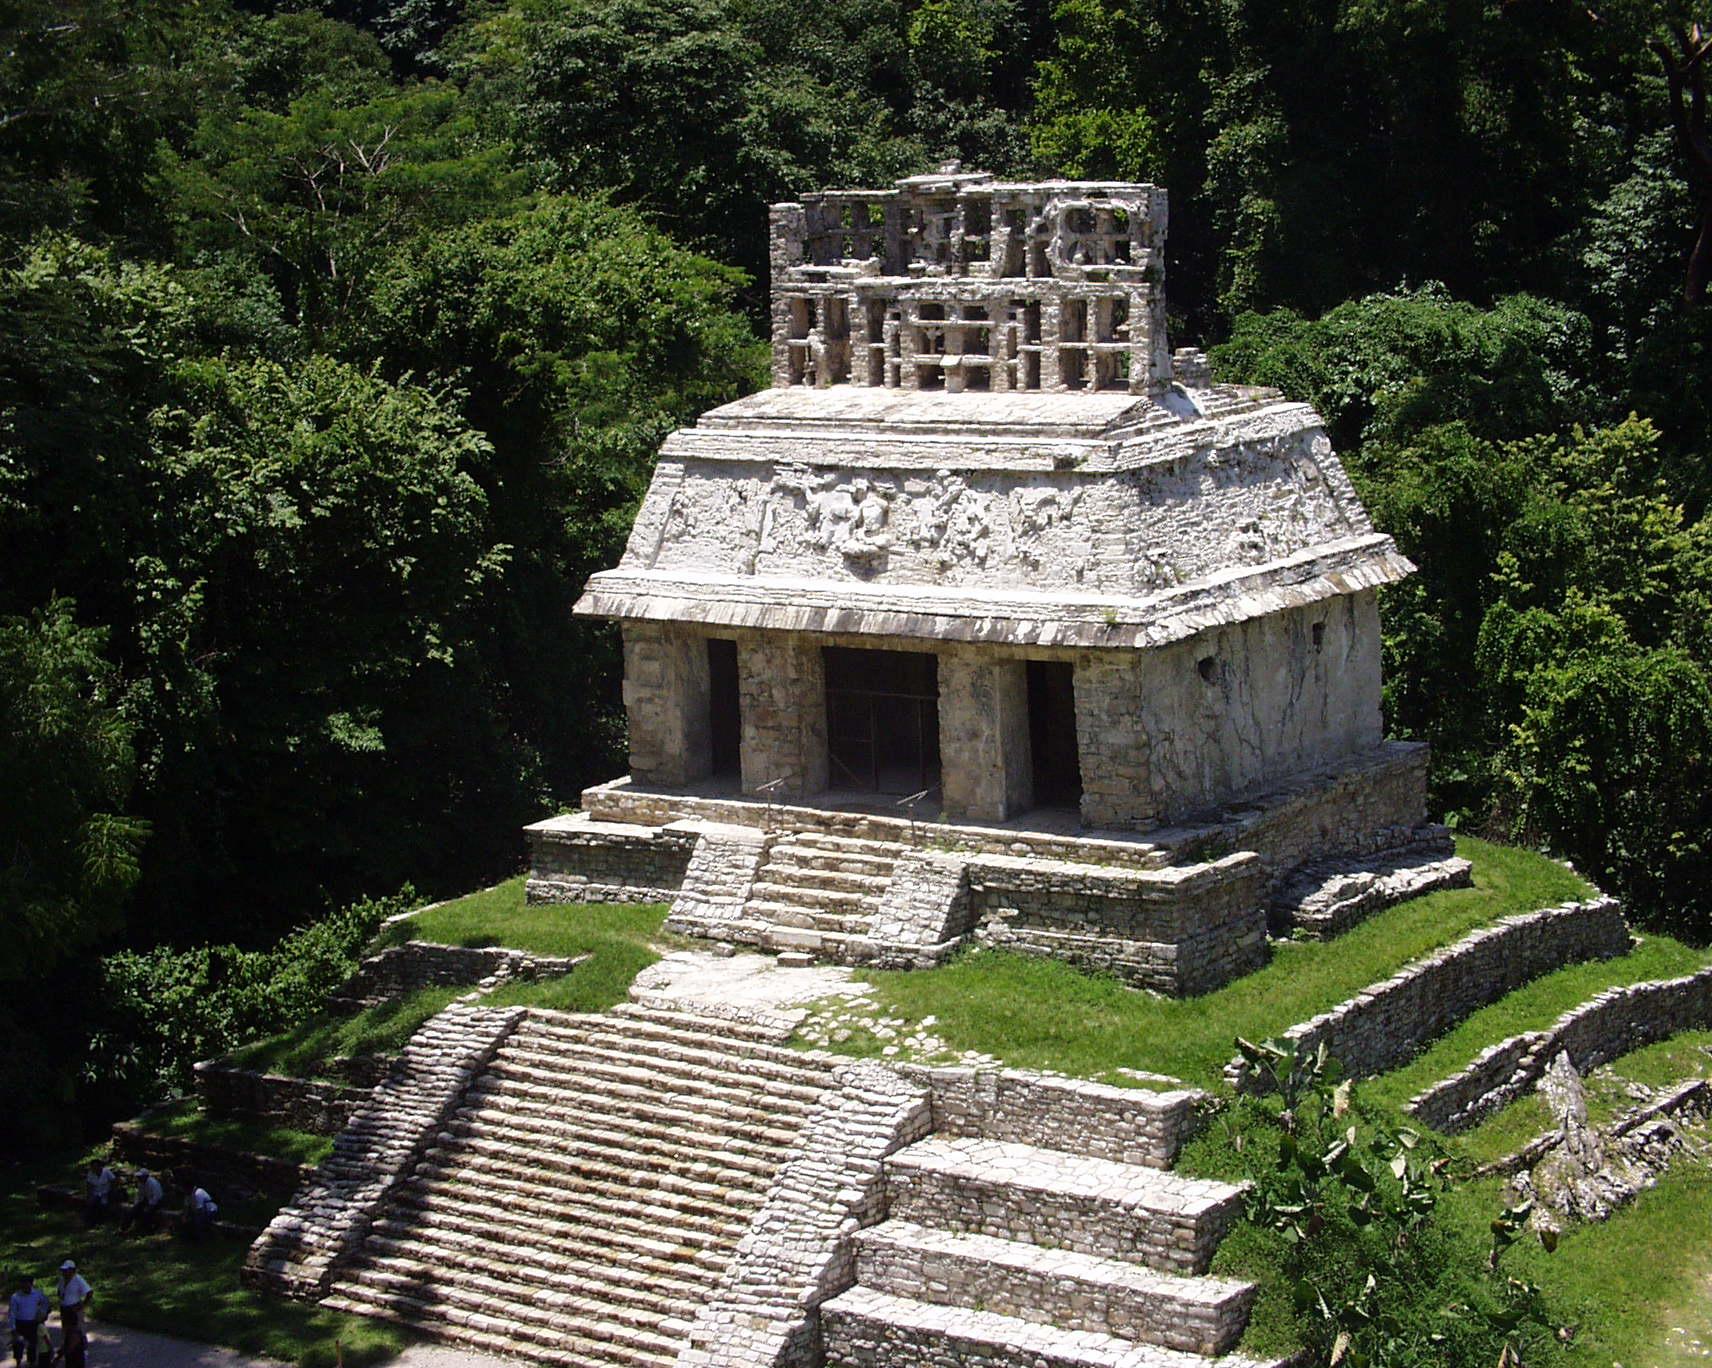 File:Palenque - Las Cruces - Templo del Sol.JPG ...